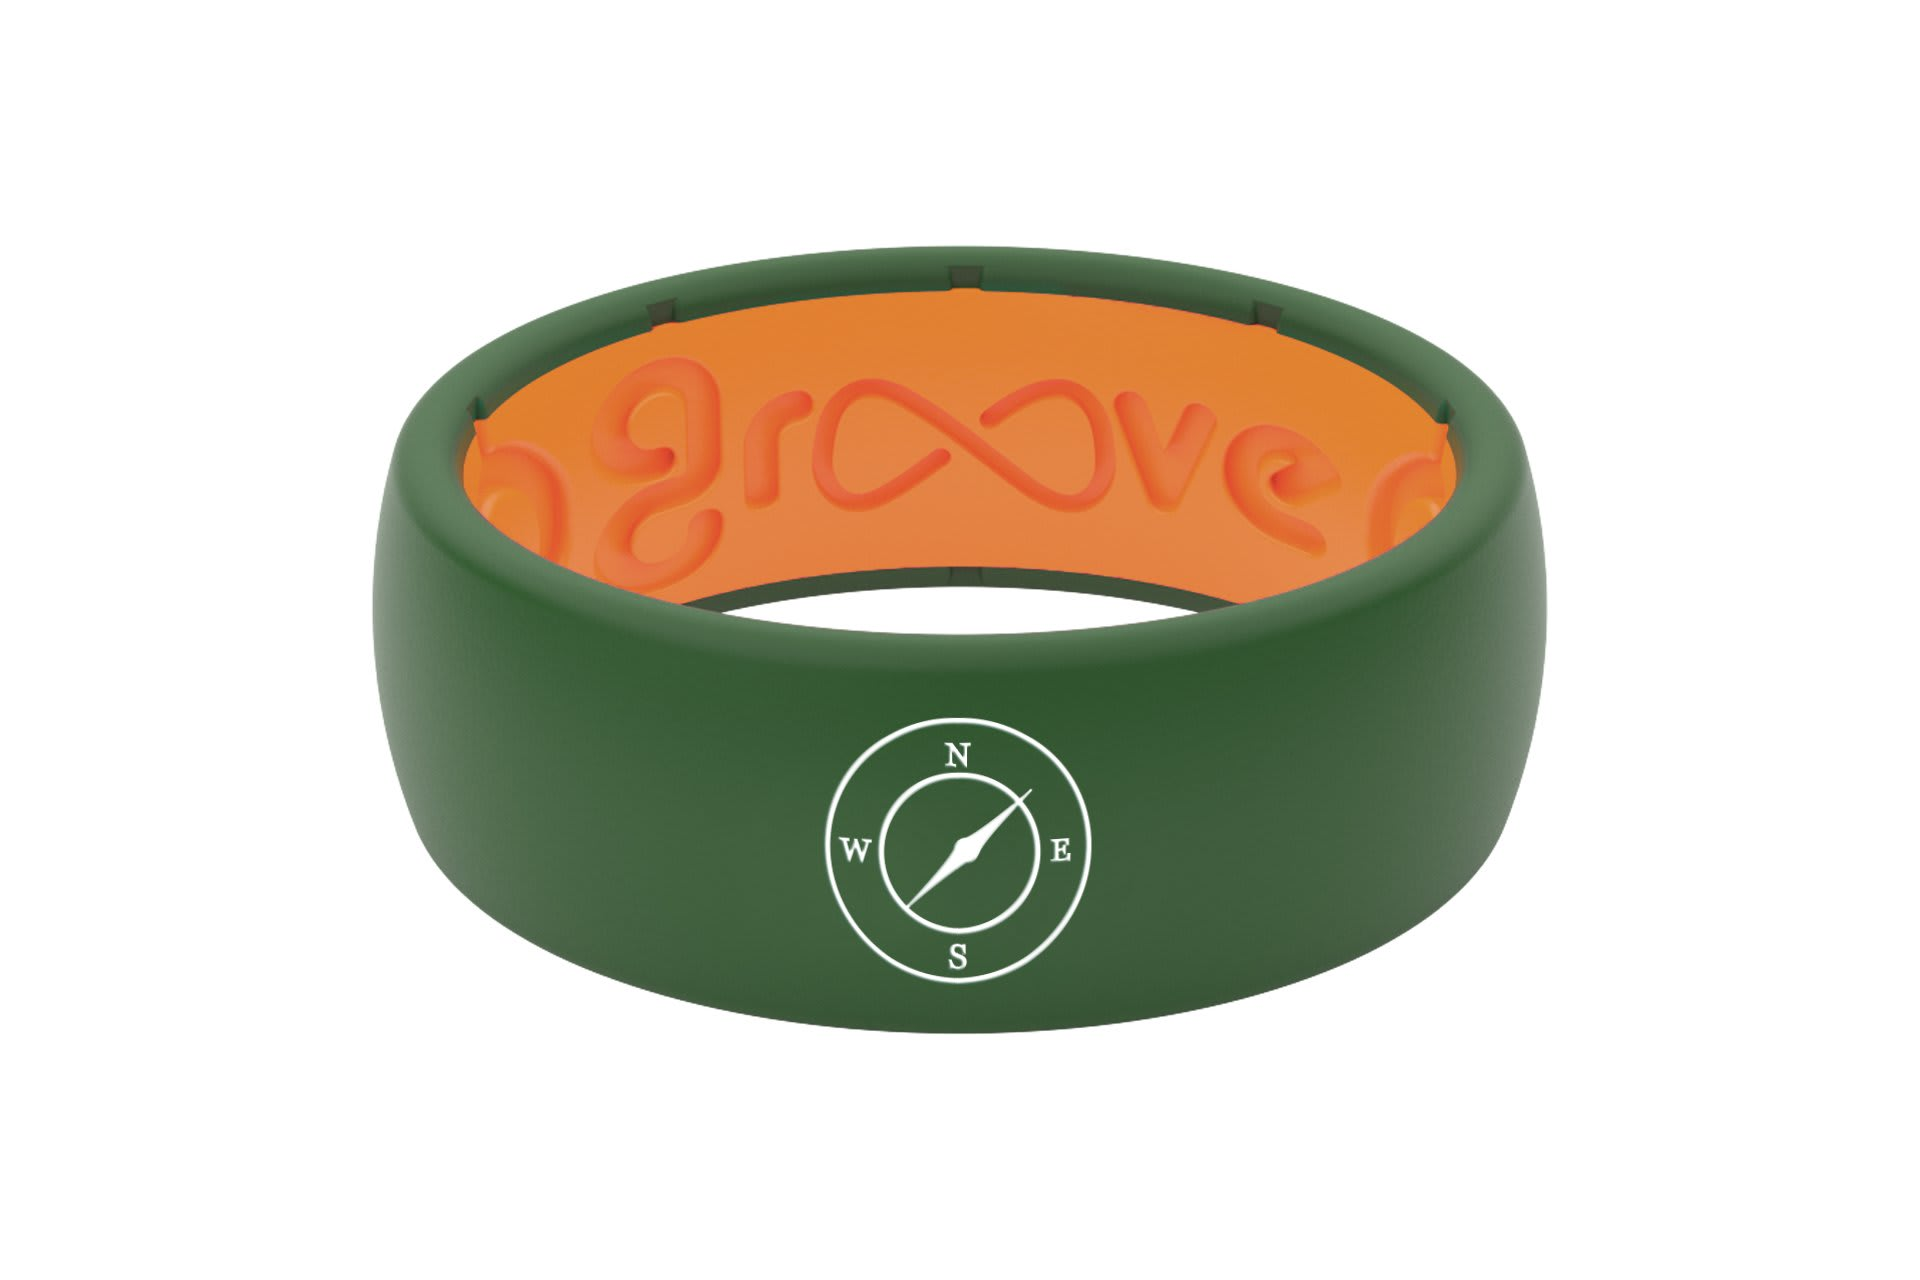 Original Custom Compass Moss Green/Orange - Groove Life